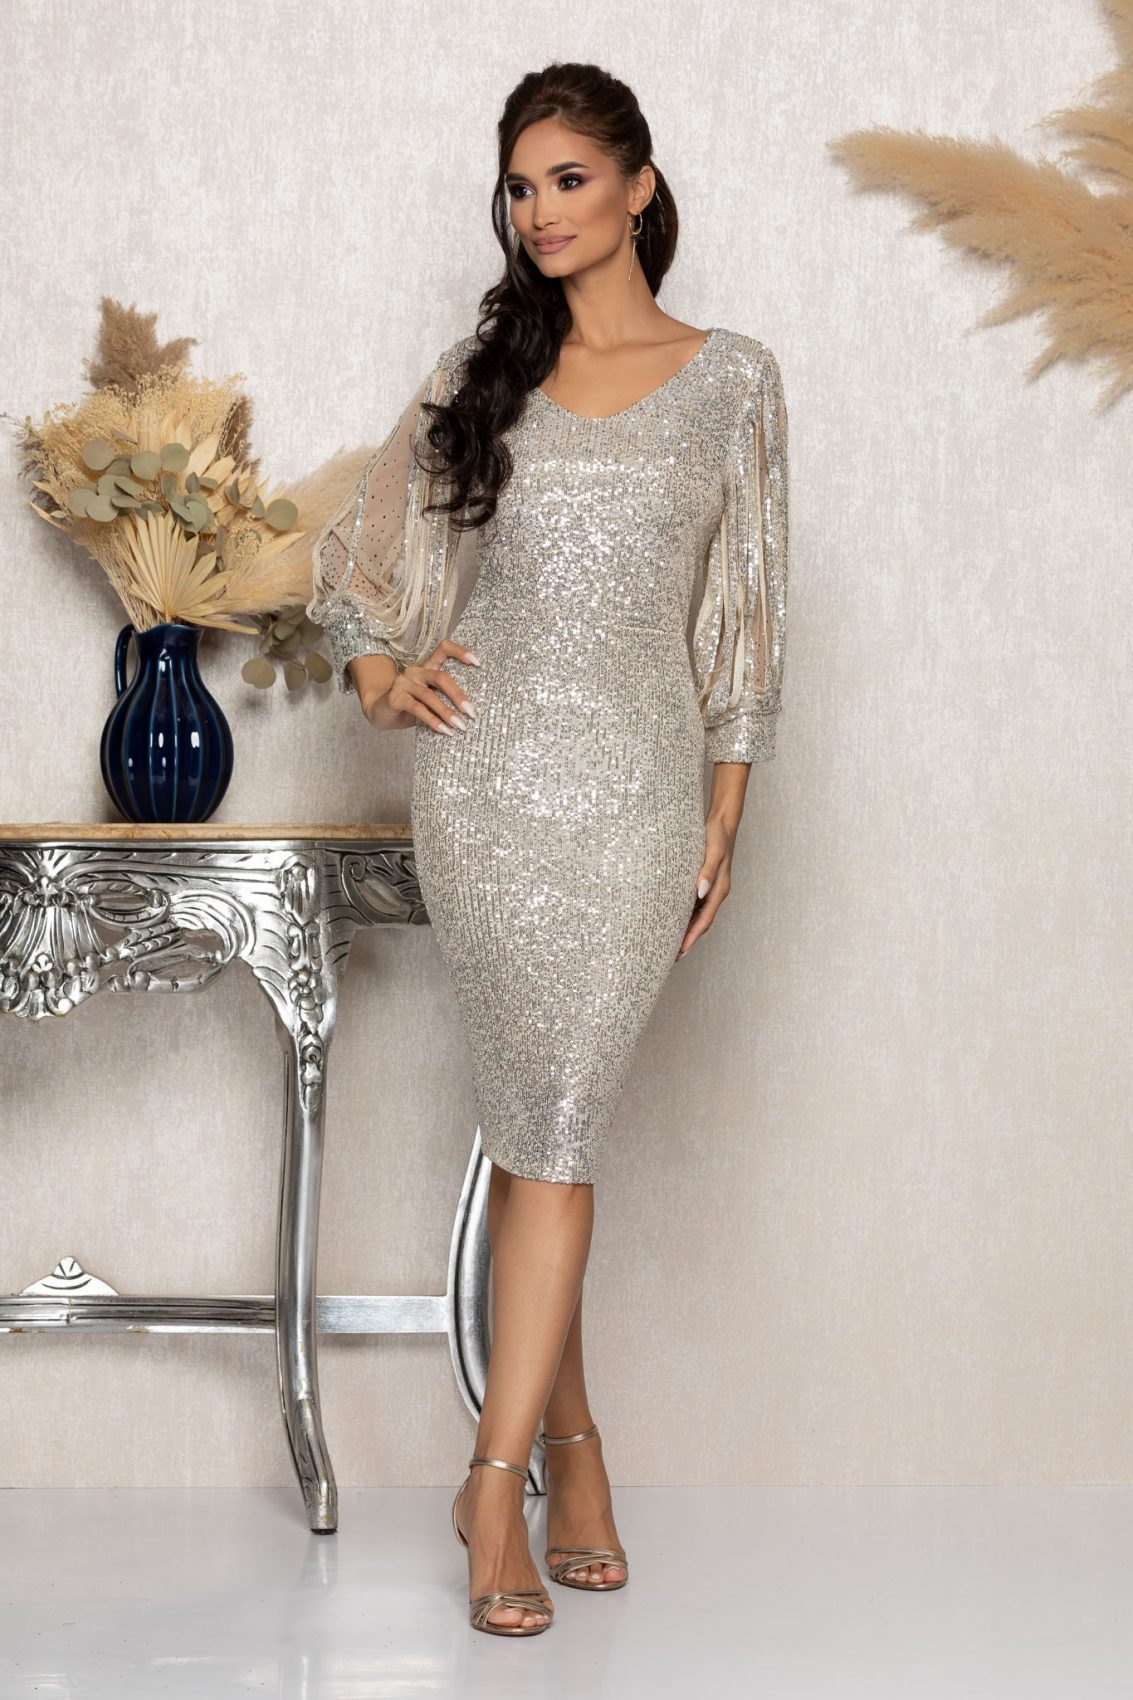 Nude Αμπιγιέ Φόρεμα Με Πούλιες Katriss A962 1